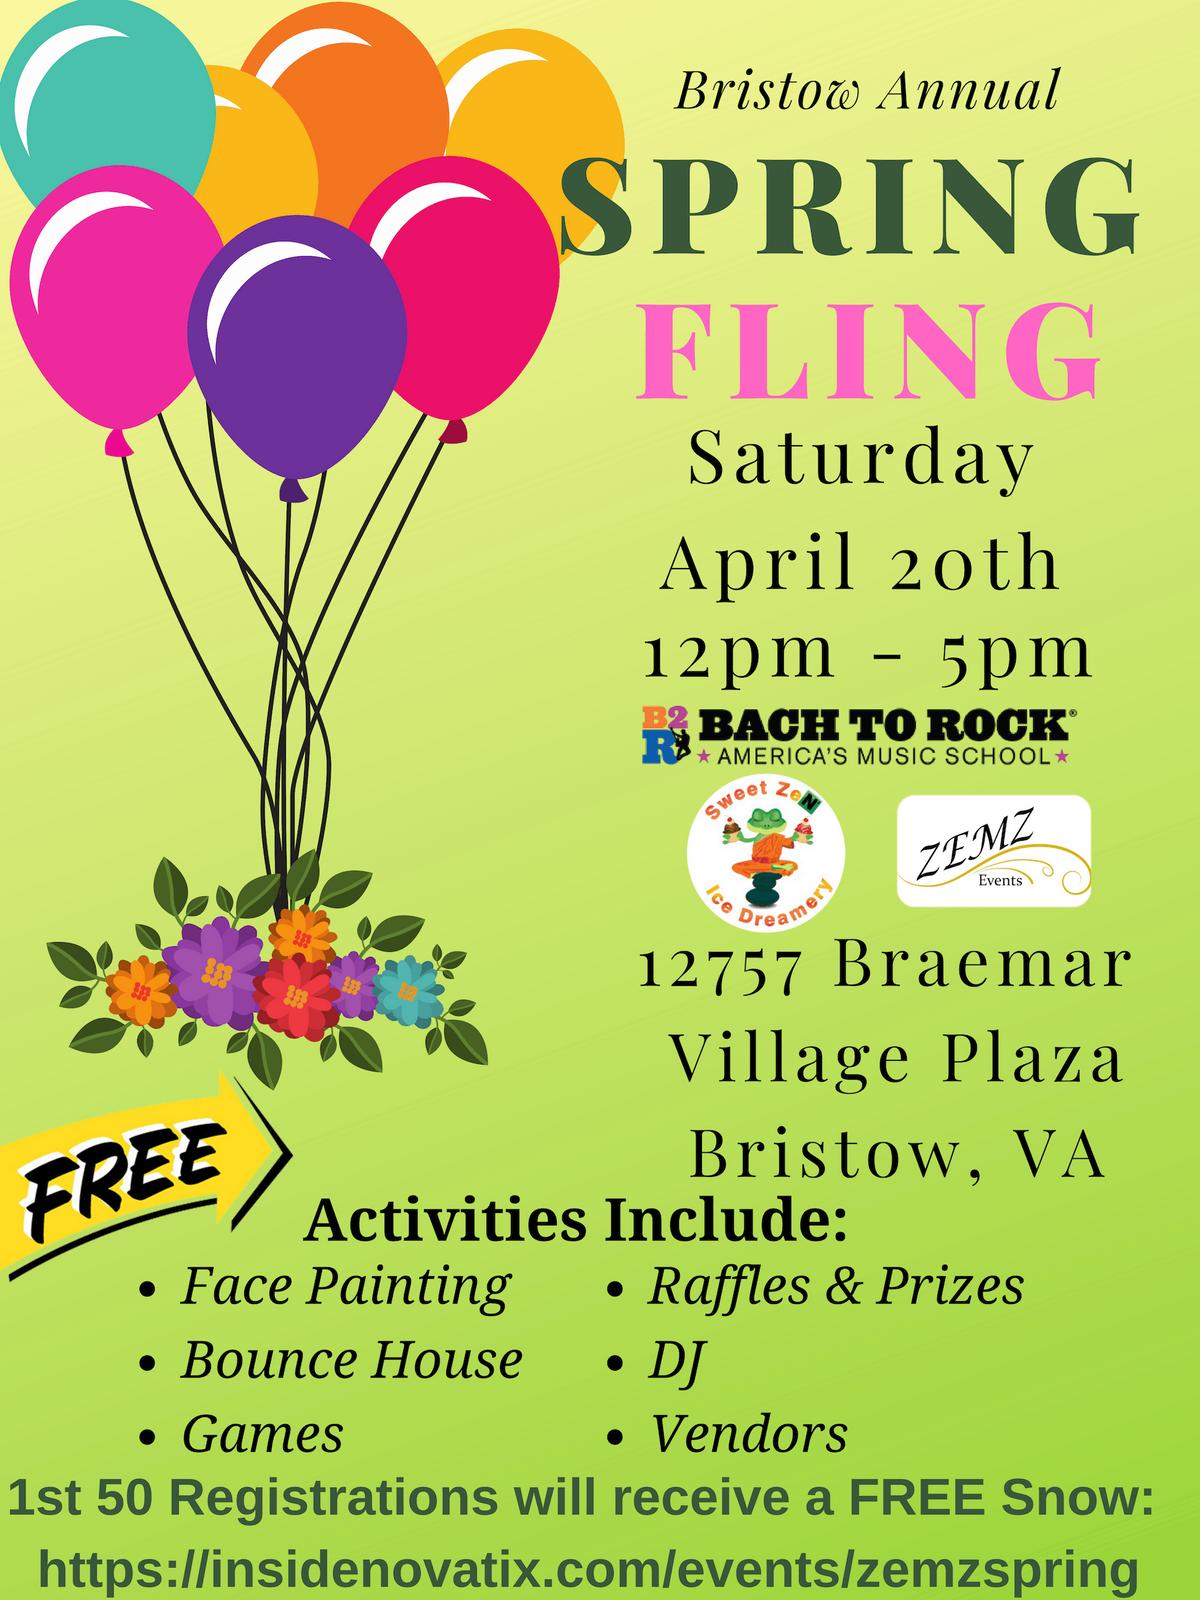 Bristow Annual Spring Fling